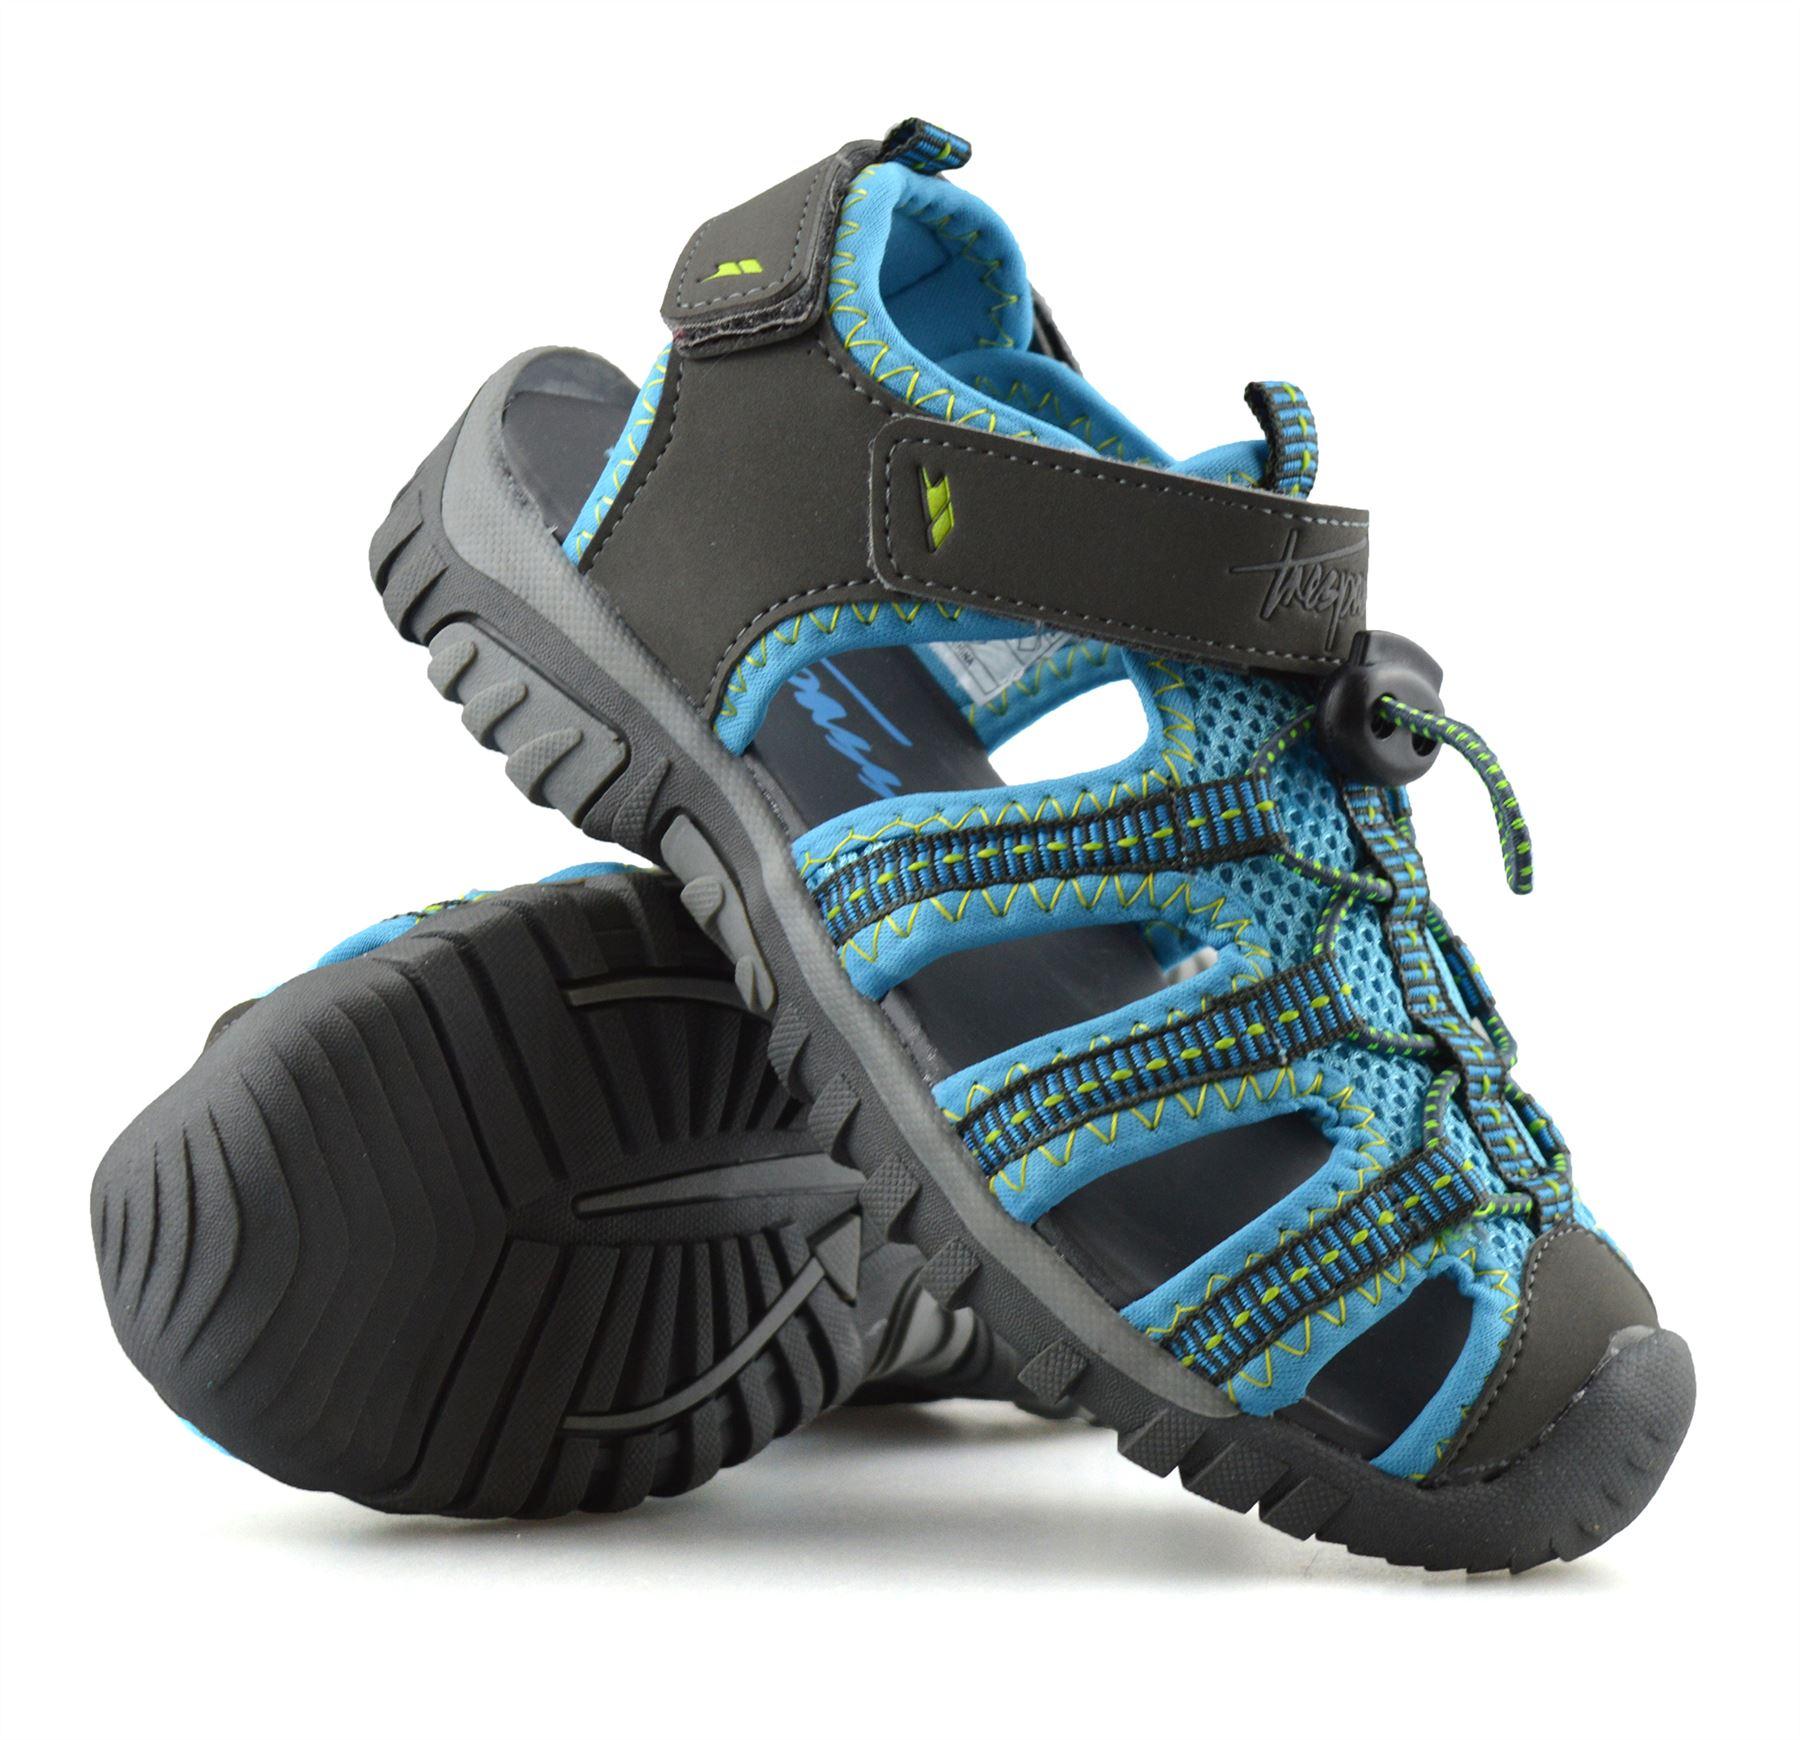 Boys-Girls-Kids-Trespass-Summer-Beach-Casual-Walking-Sports-Sandals-Shoes-Size thumbnail 27